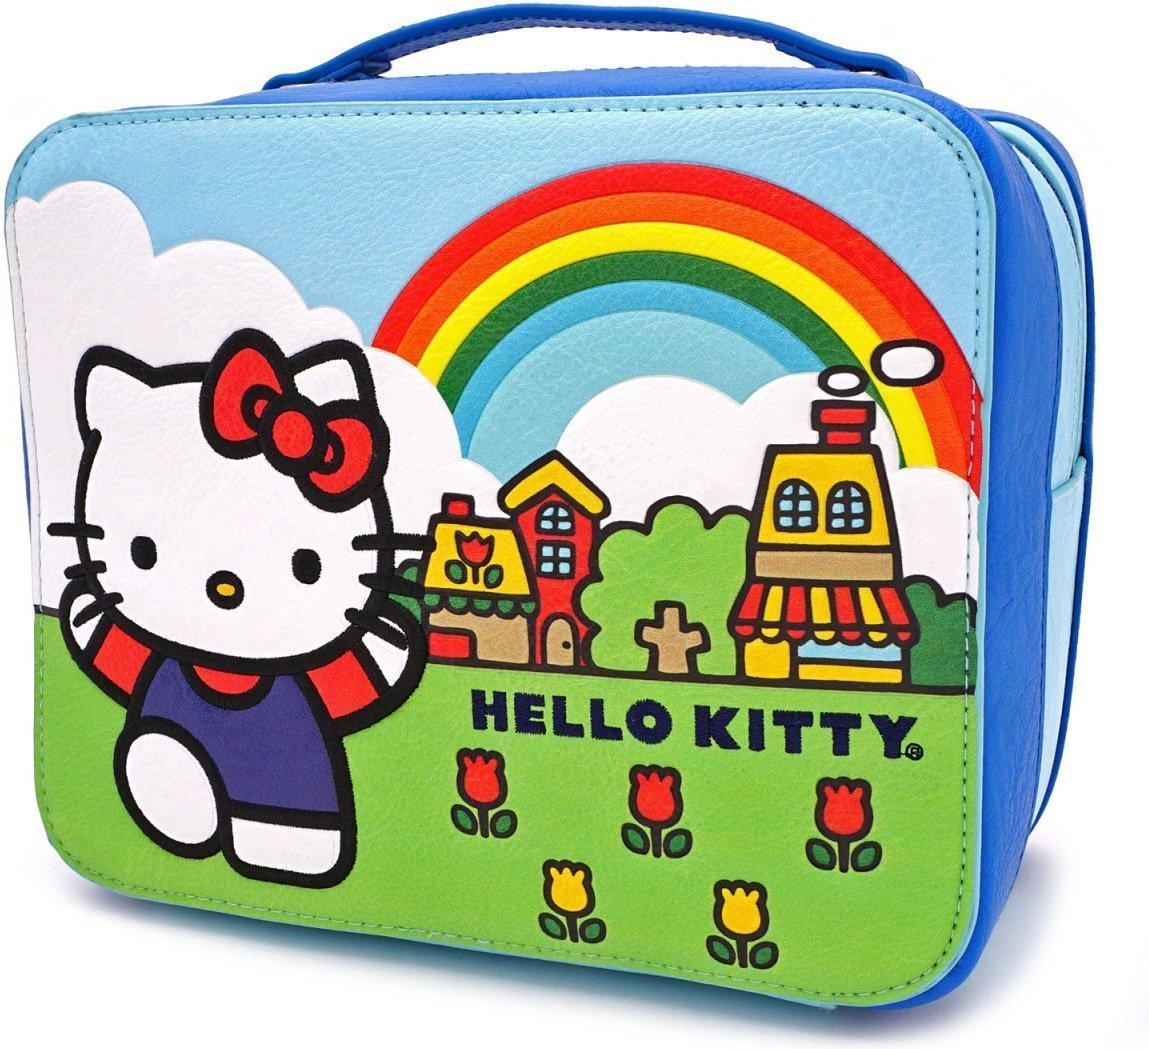 Loungefly: Hello Kitty - Rainbow Lunchbox Handbag image